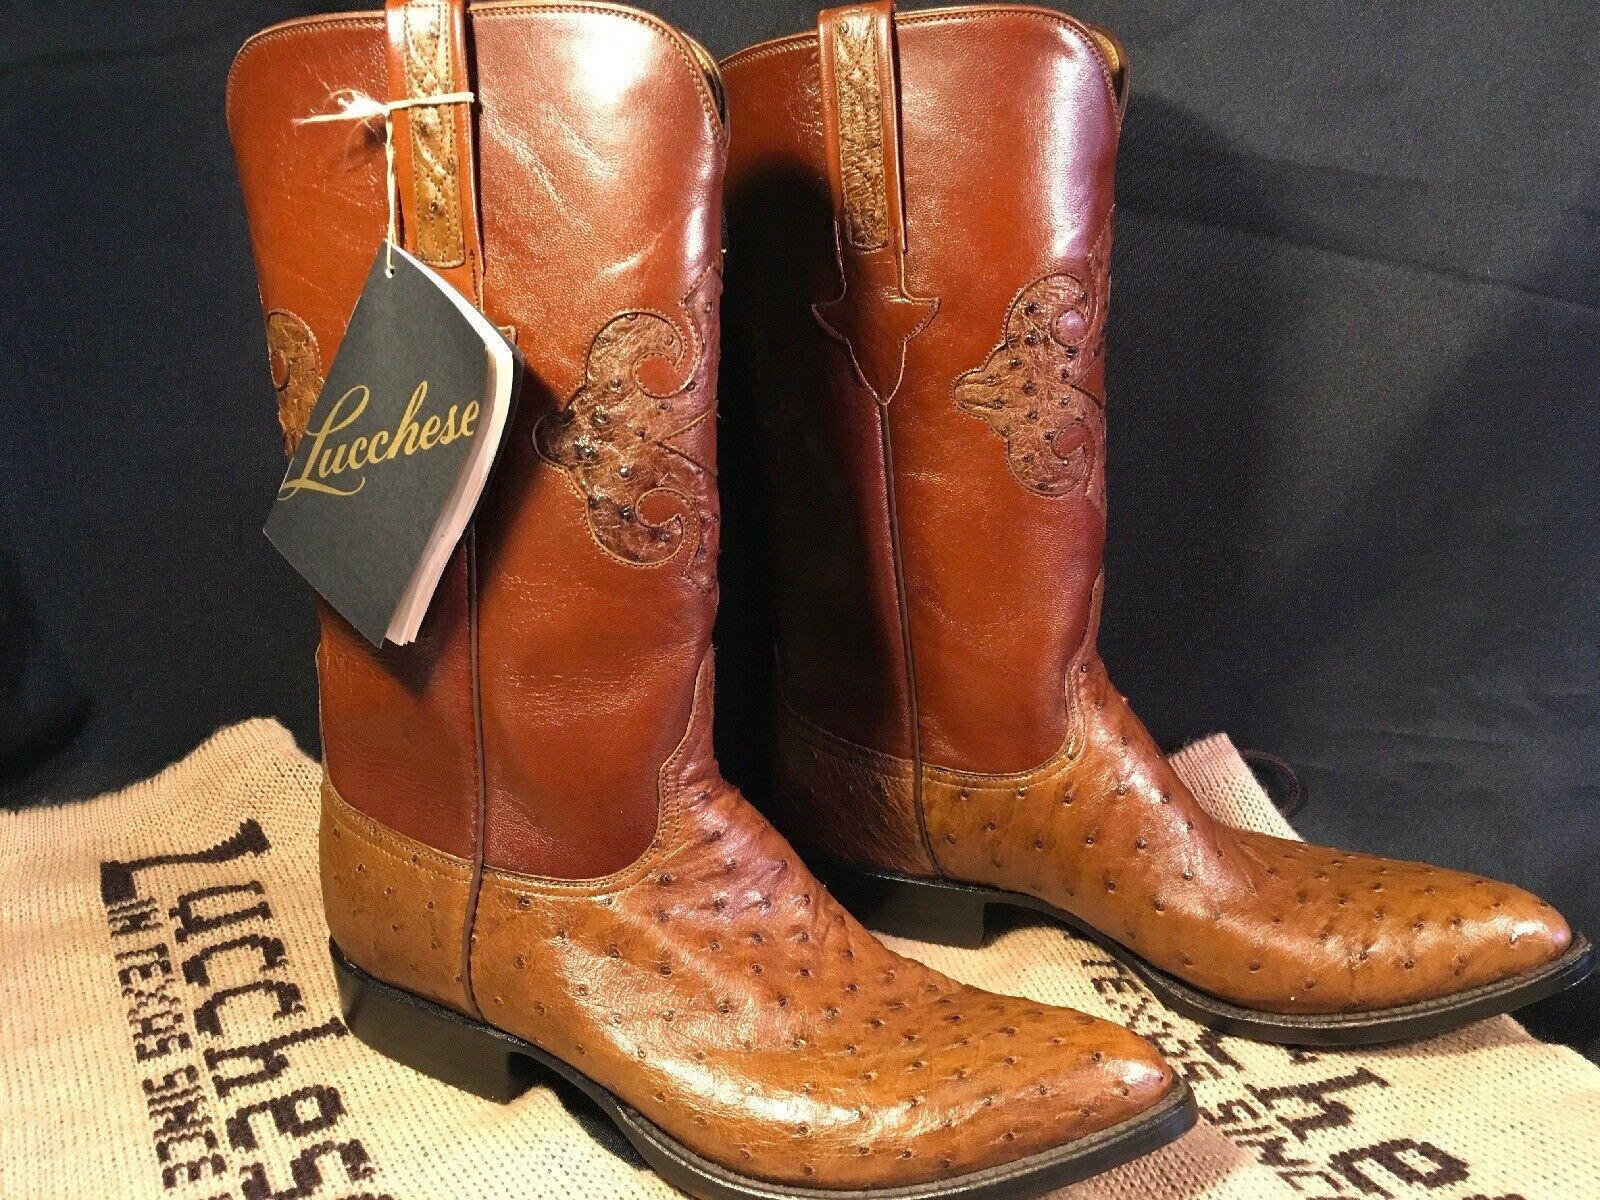 LUCCHESE botas EXOTIC Completo Pluma Avestruz 8.5 D botas De Vaquero Nuevo Nunca Usado W Tag